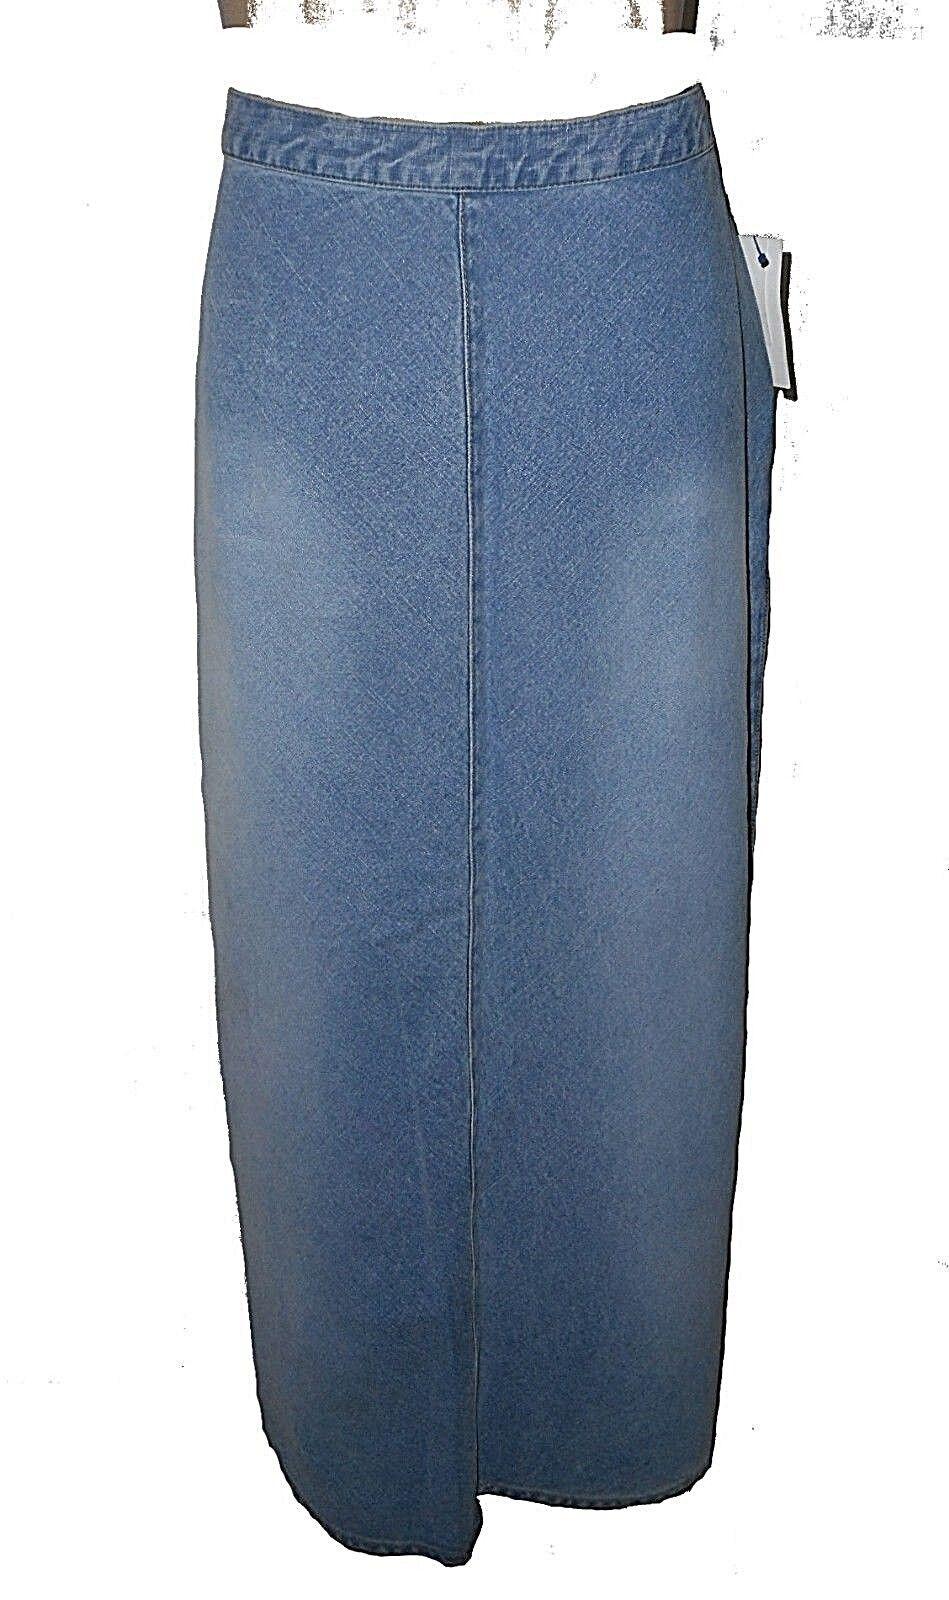 New Skirt, Liz Claiborne Lizwear  Jeans, Denim Cotton Stretch Long MSRP- 70. 12P